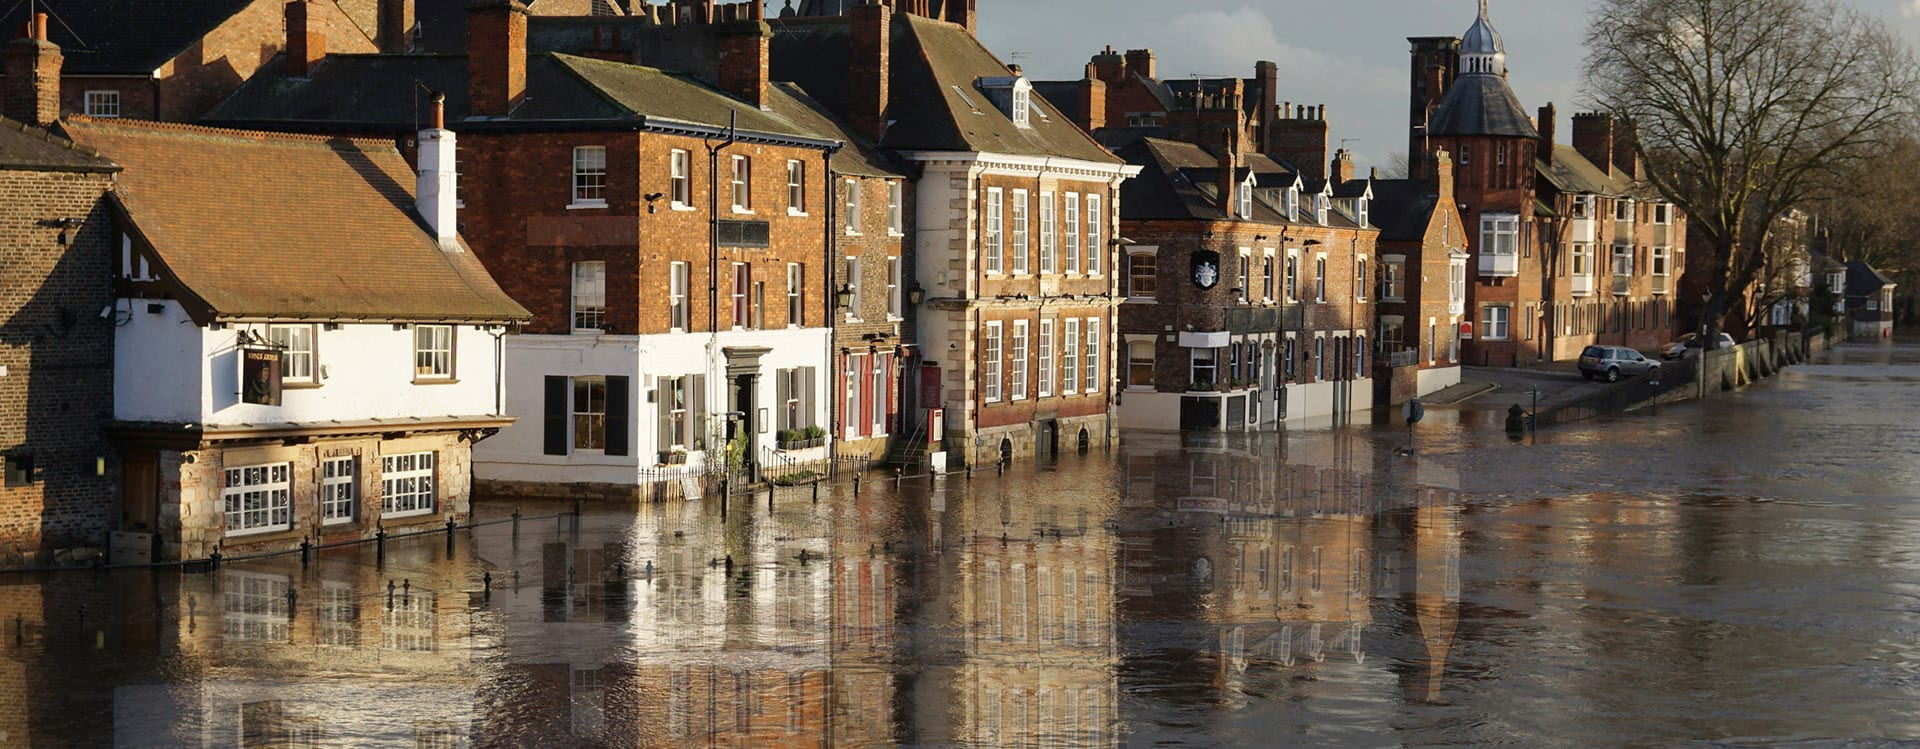 Flood Risk C